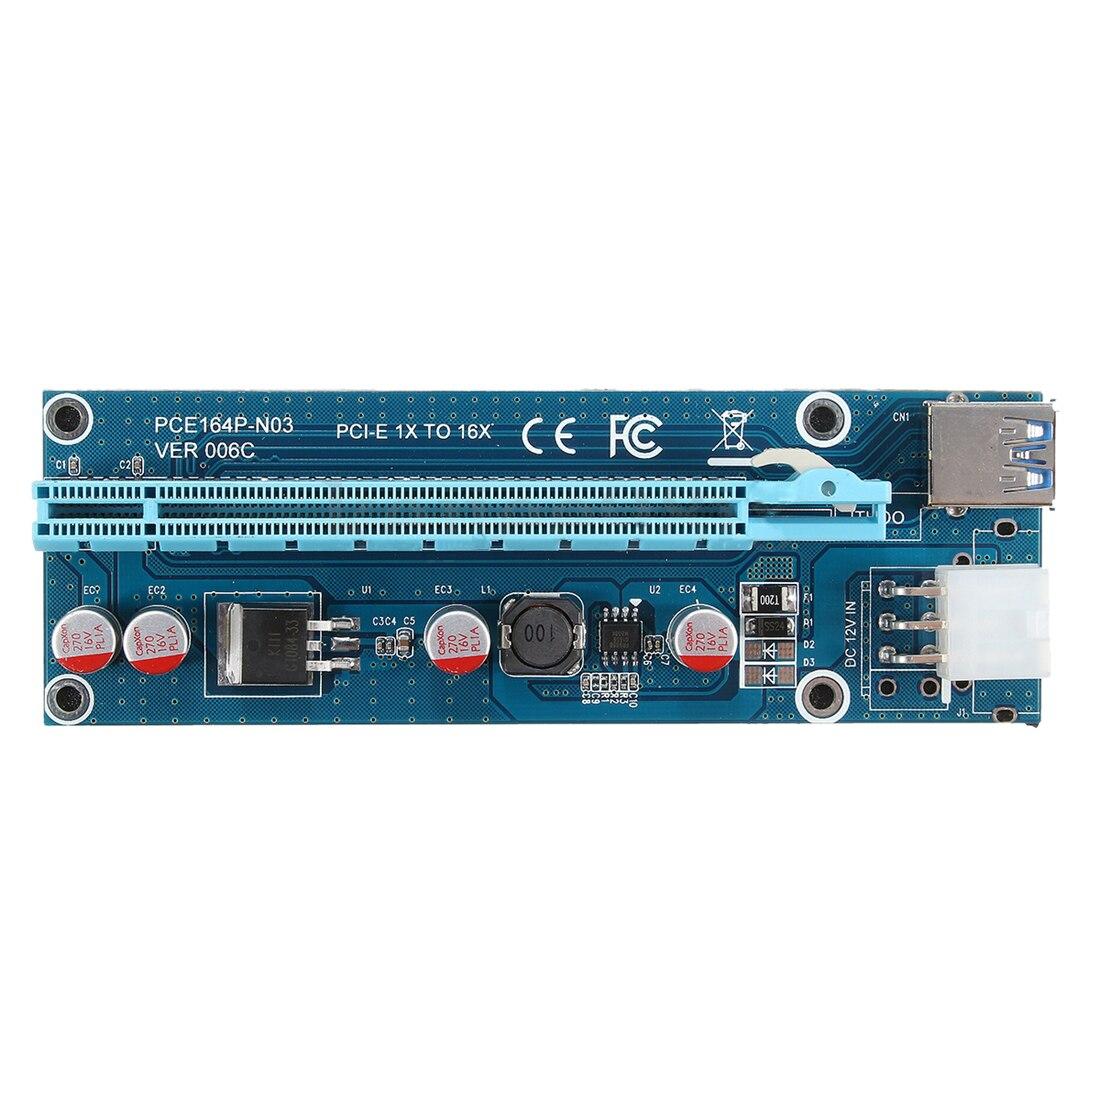 5 Pz USB3.0 PCI-E Express 1x A 16x Extender Riser Card Adapter SATA 15Pin-4Pin Cavo Blu